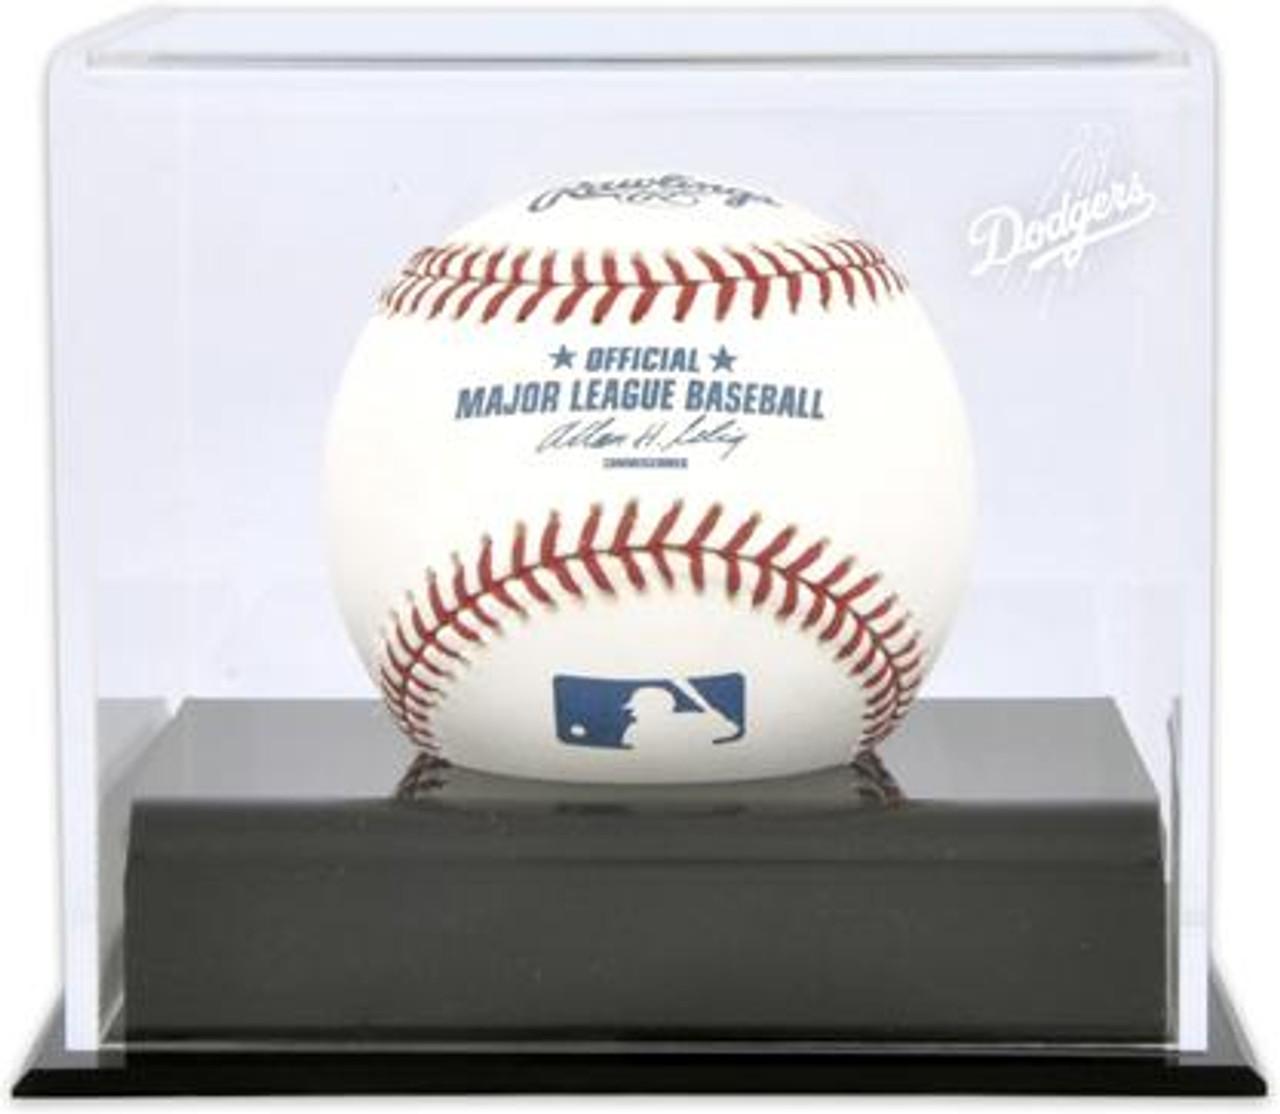 Autographs-original Hot Sale Kurt Suzuki Autographed Rawlings Official Mlb Baseball